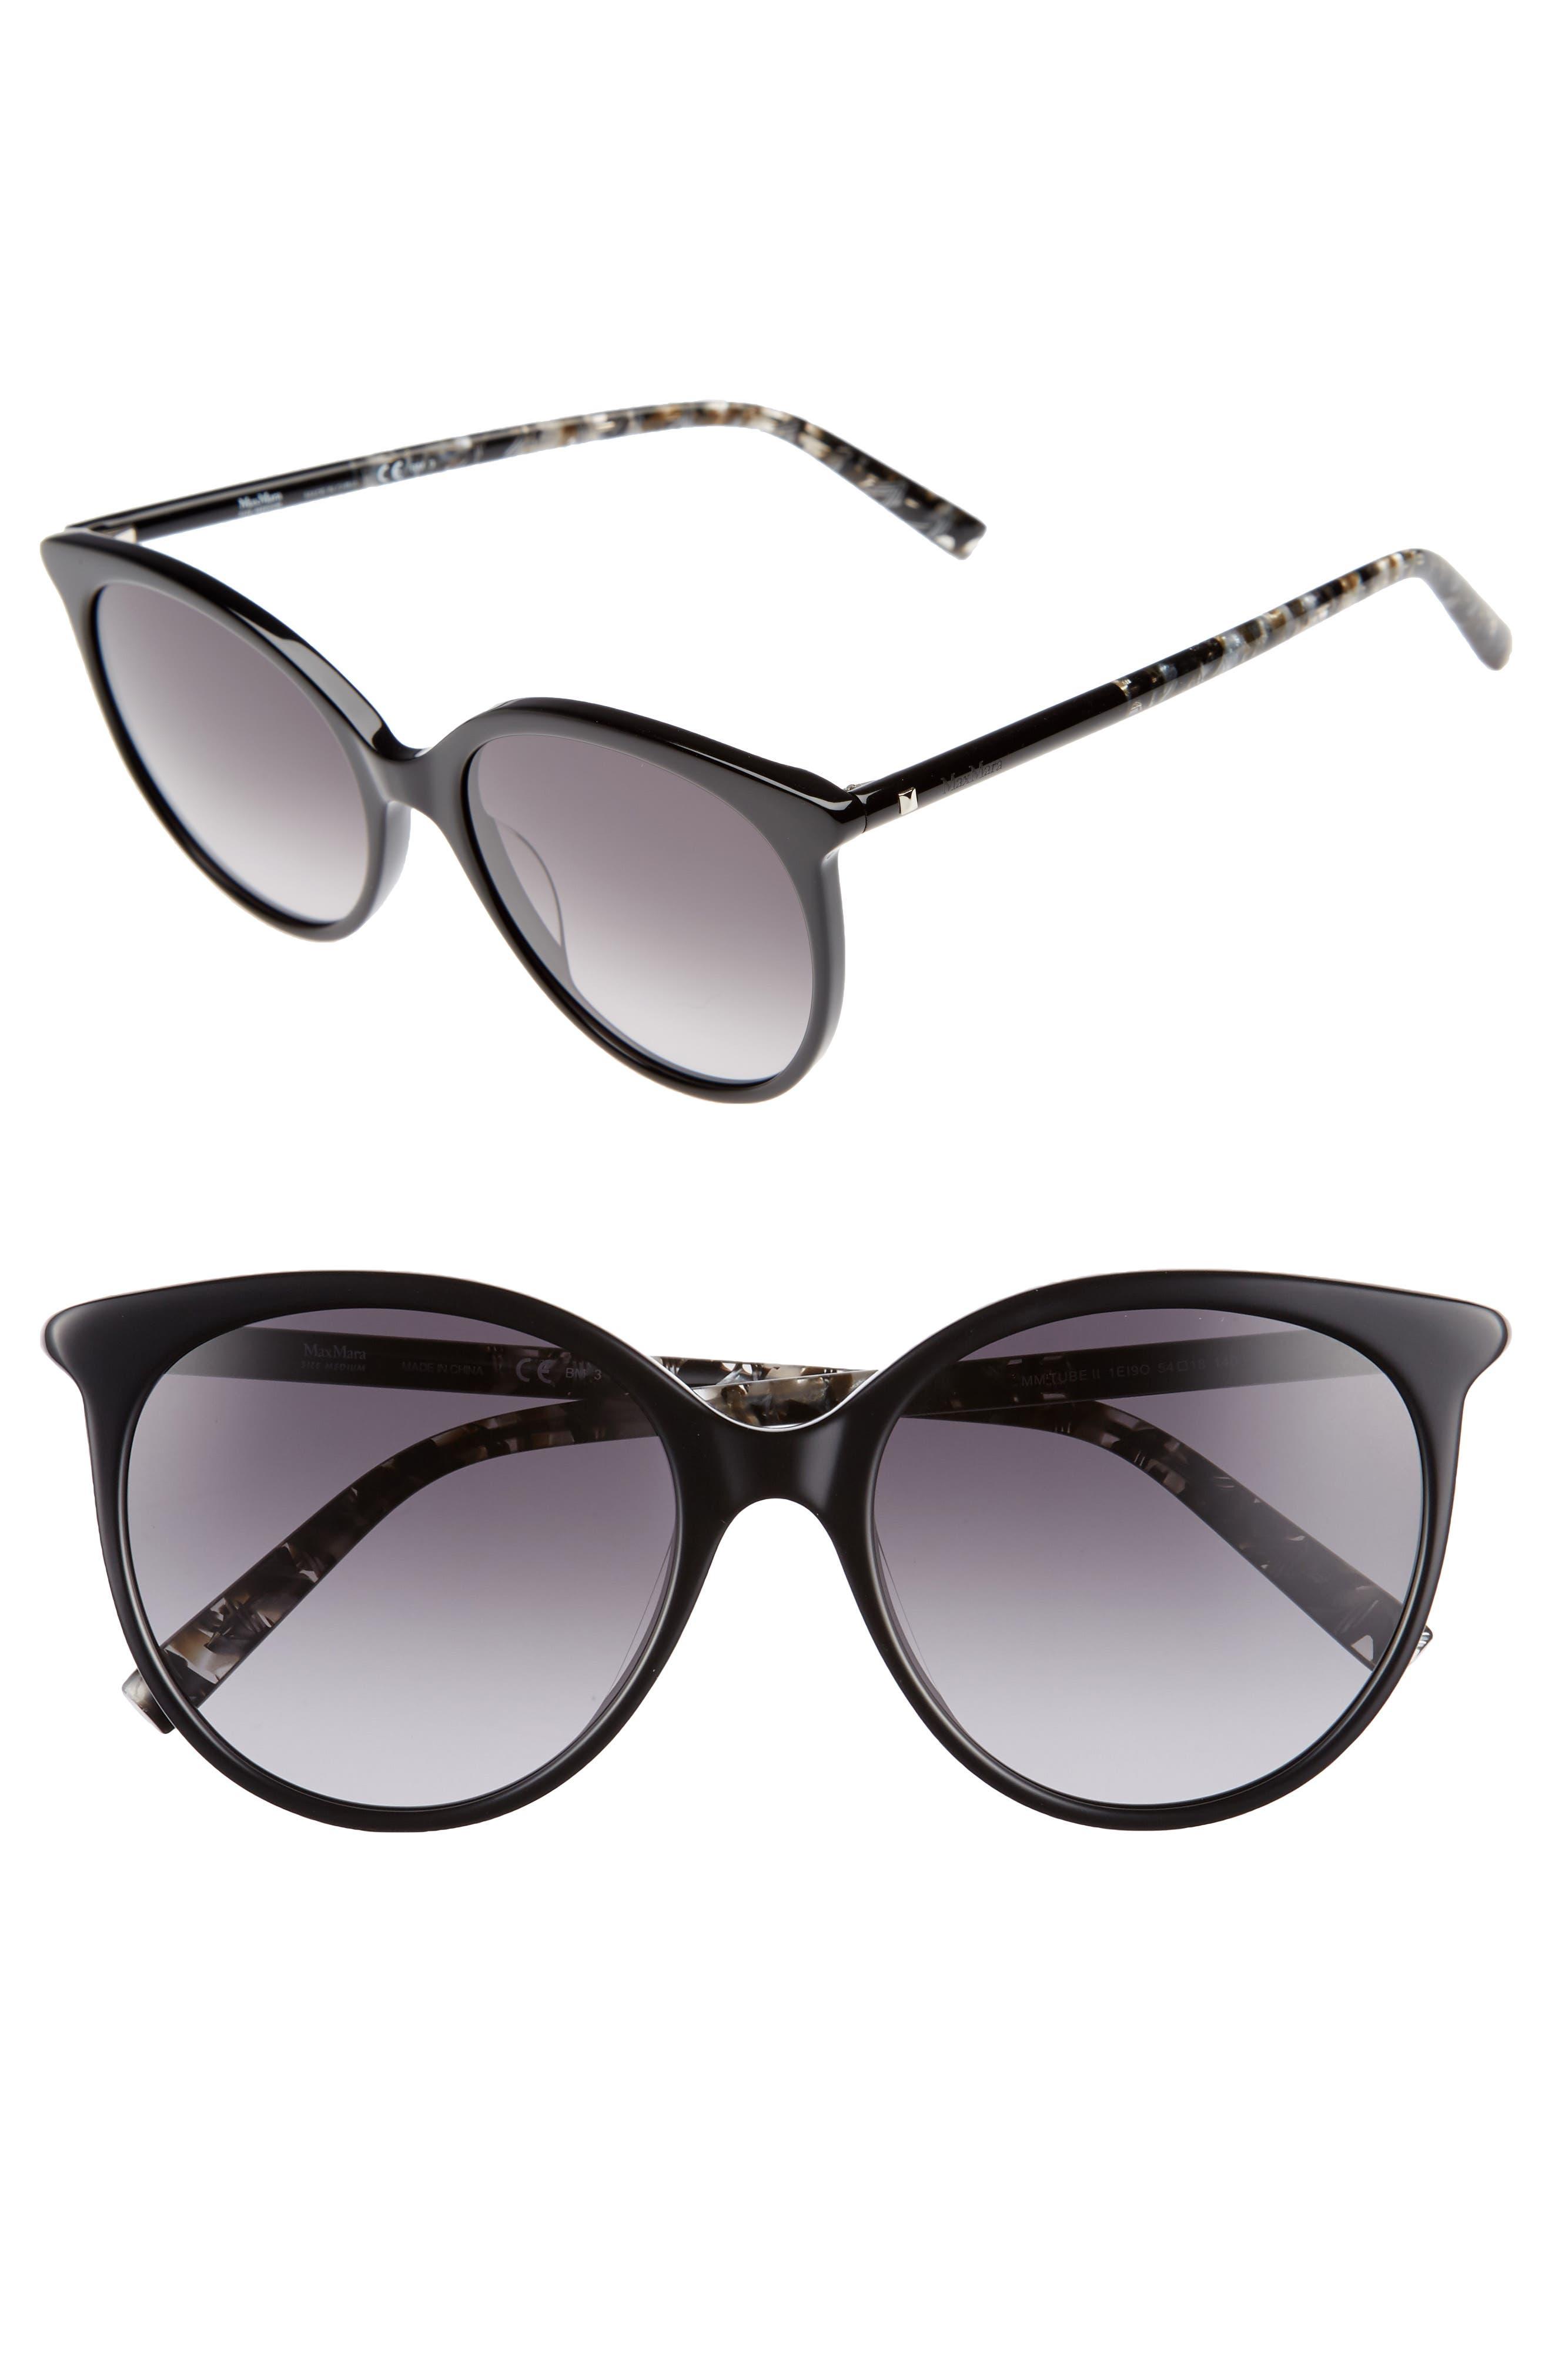 Tube 54mm Gradient Lens Cat Eye Sunglasses,                             Main thumbnail 1, color,                             BLACK/ GREY